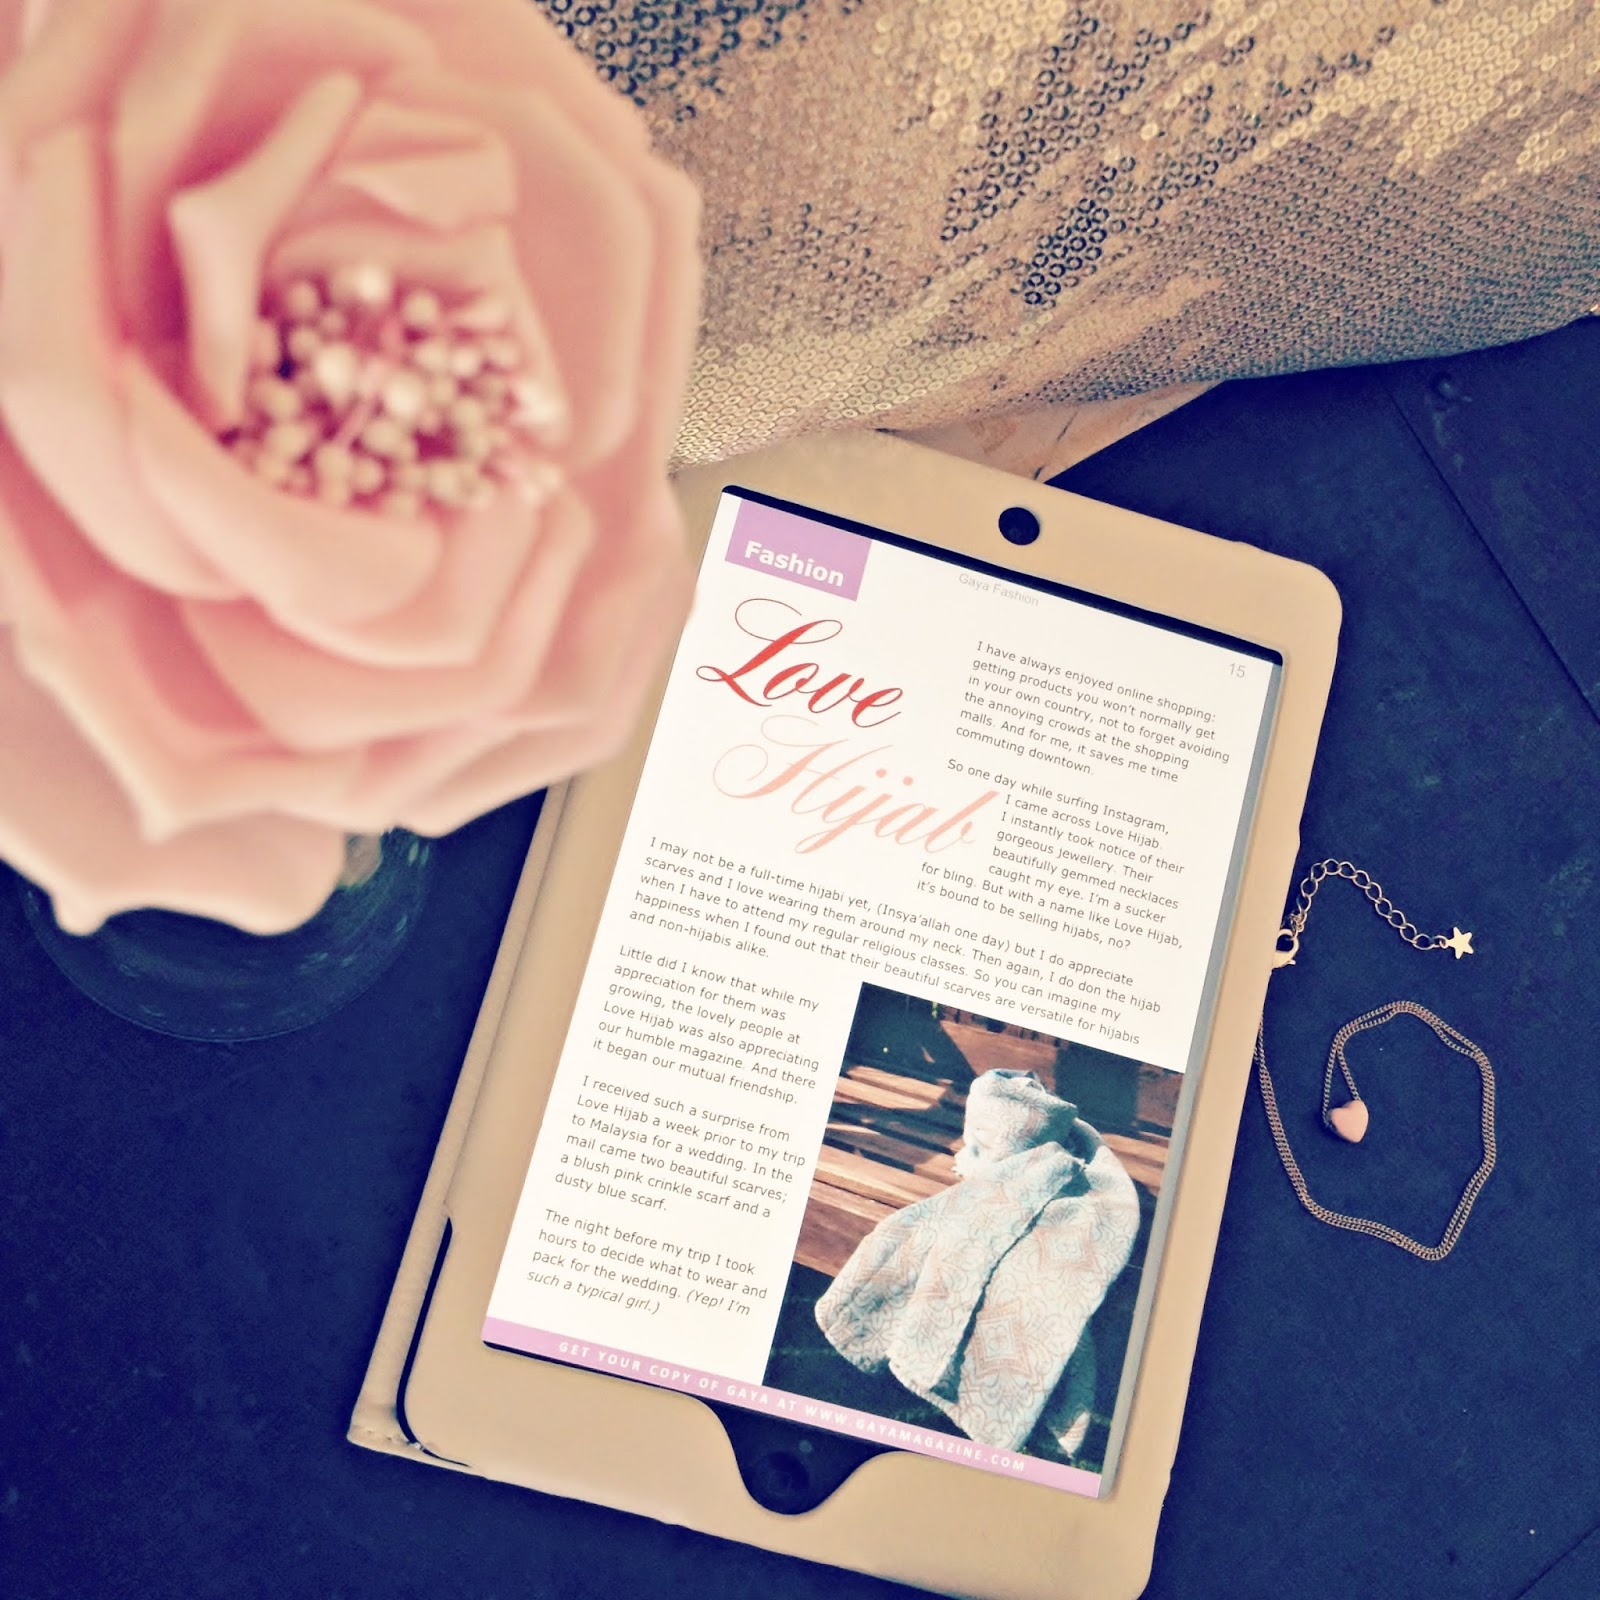 http://lovehijabgirl.blogspot.co.uk/2014/04/gaya-magazine-feature.html